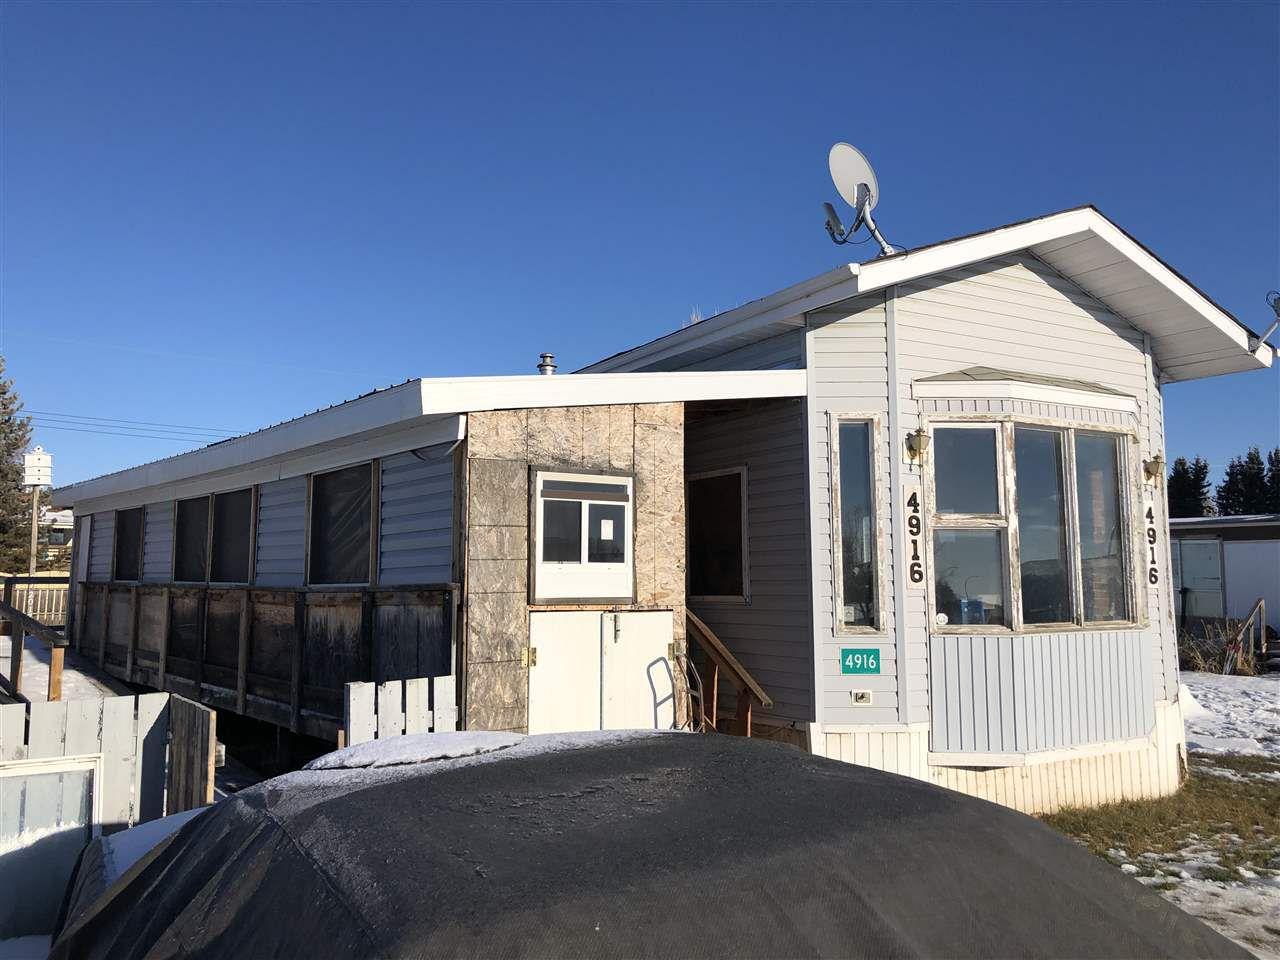 Main Photo: 4916 48 Avenue: Vimy Manufactured Home for sale : MLS®# E4137138